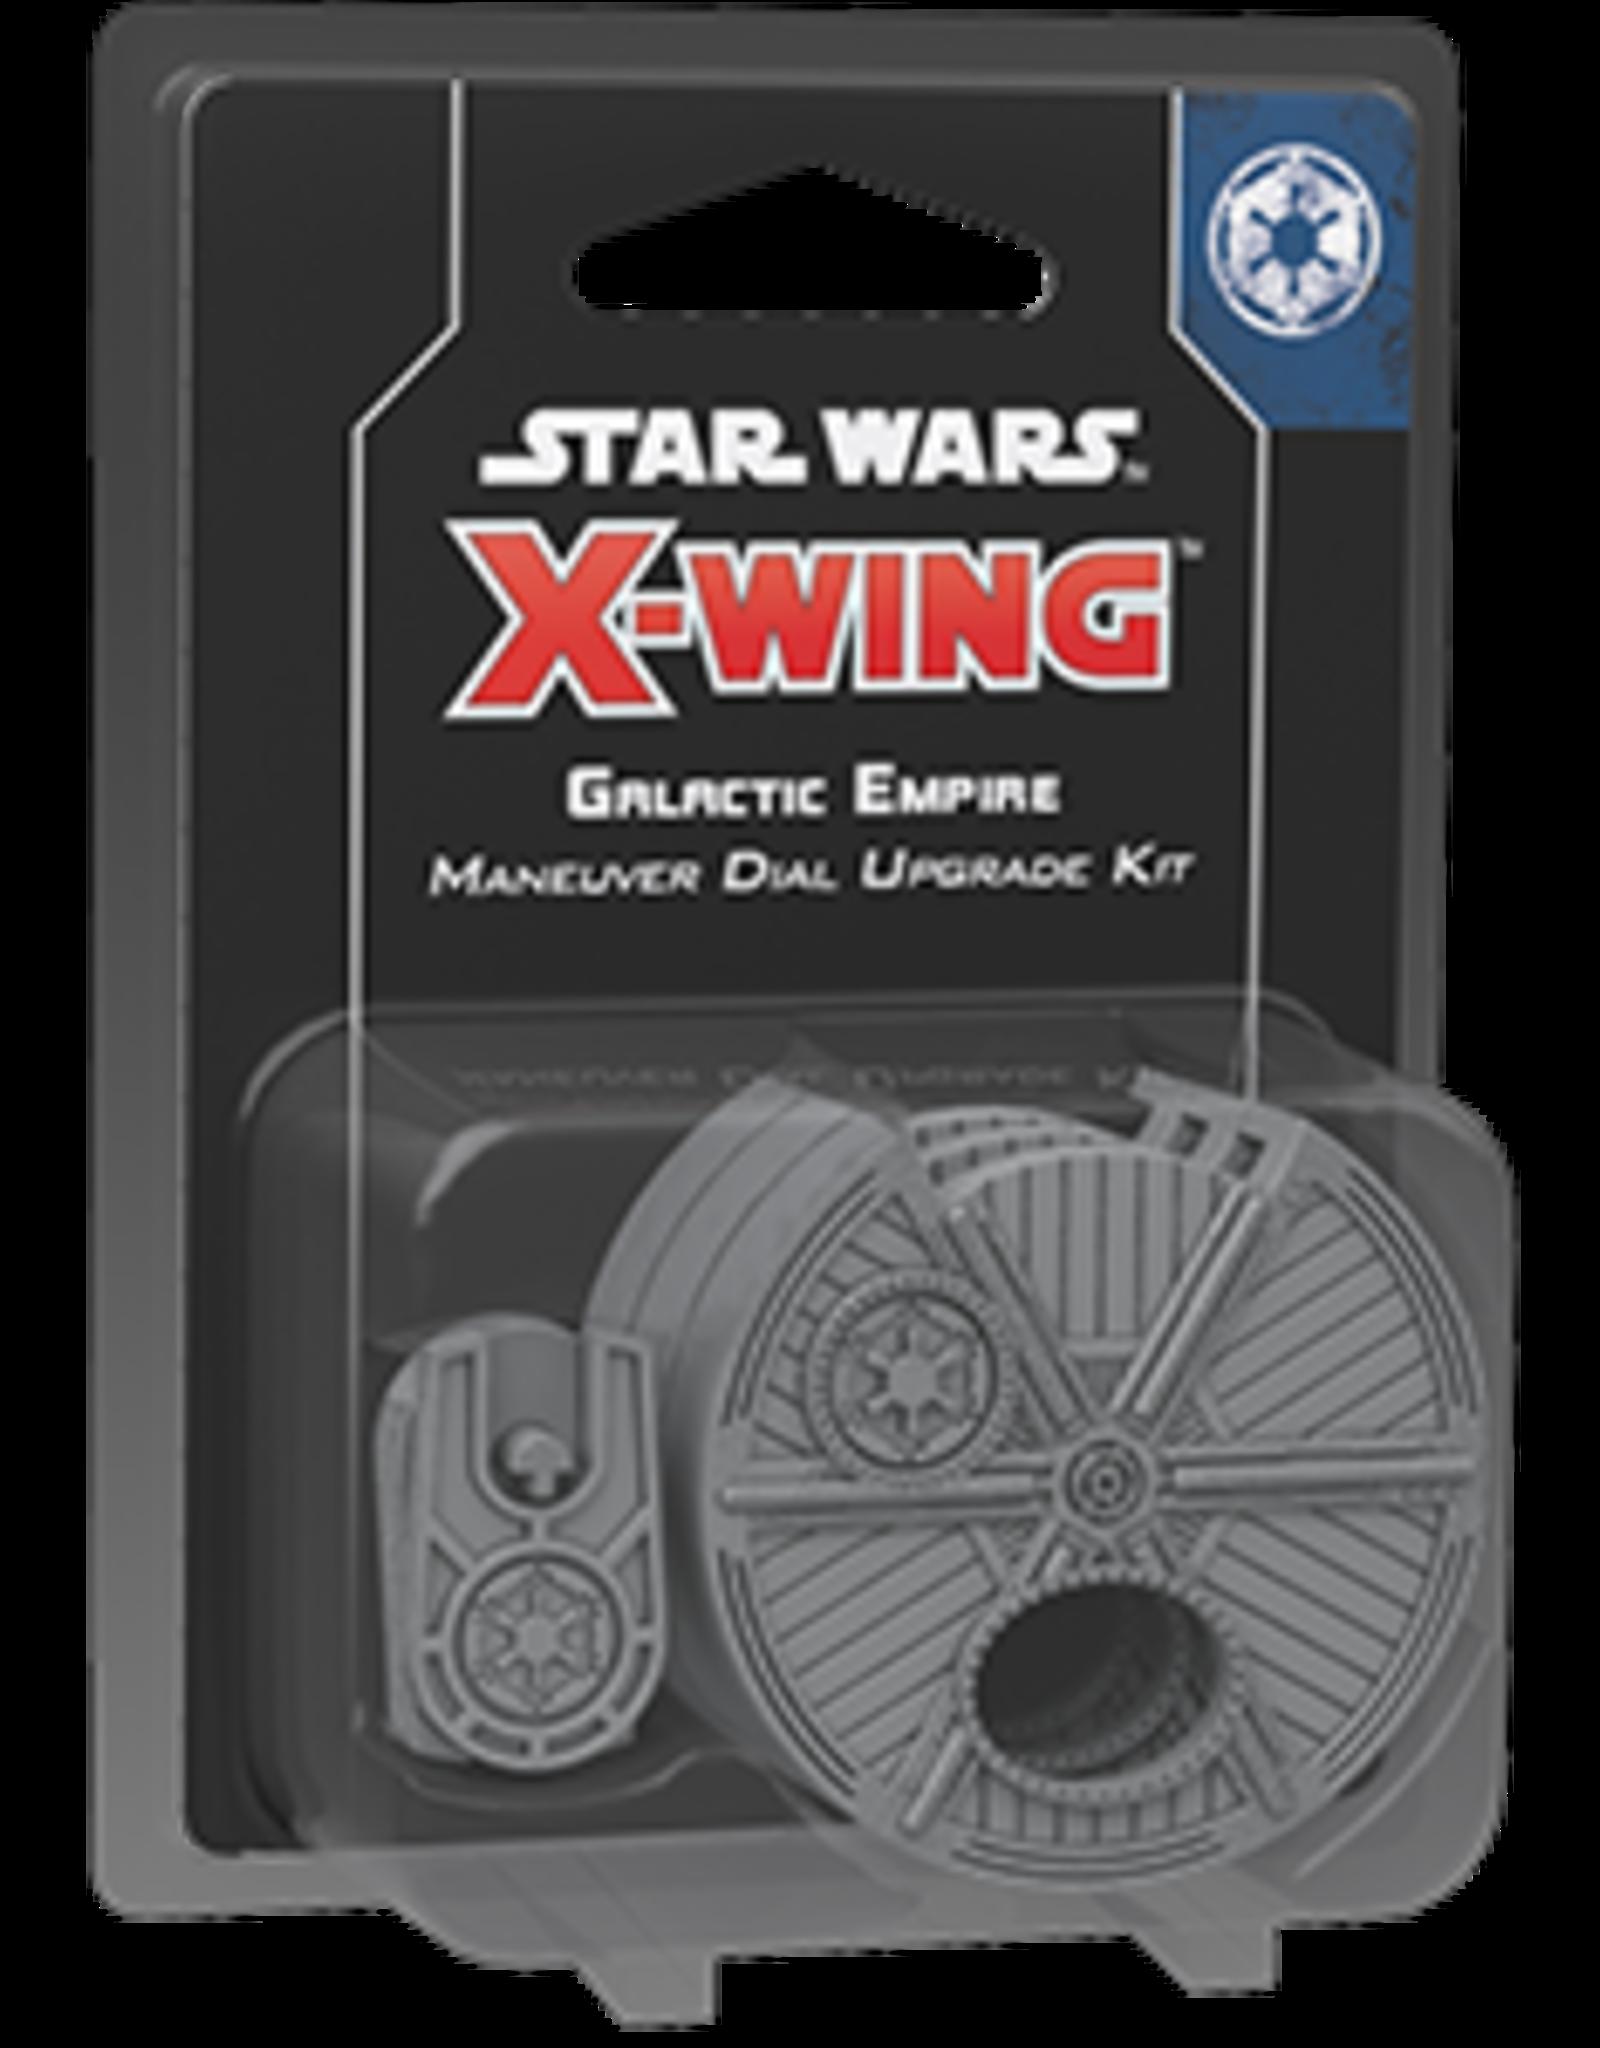 Fantasy Flight Star Wars X-Wing 2.0 Miniatures Game: Galactic Empire Maneuver Dial Upgrade Kit